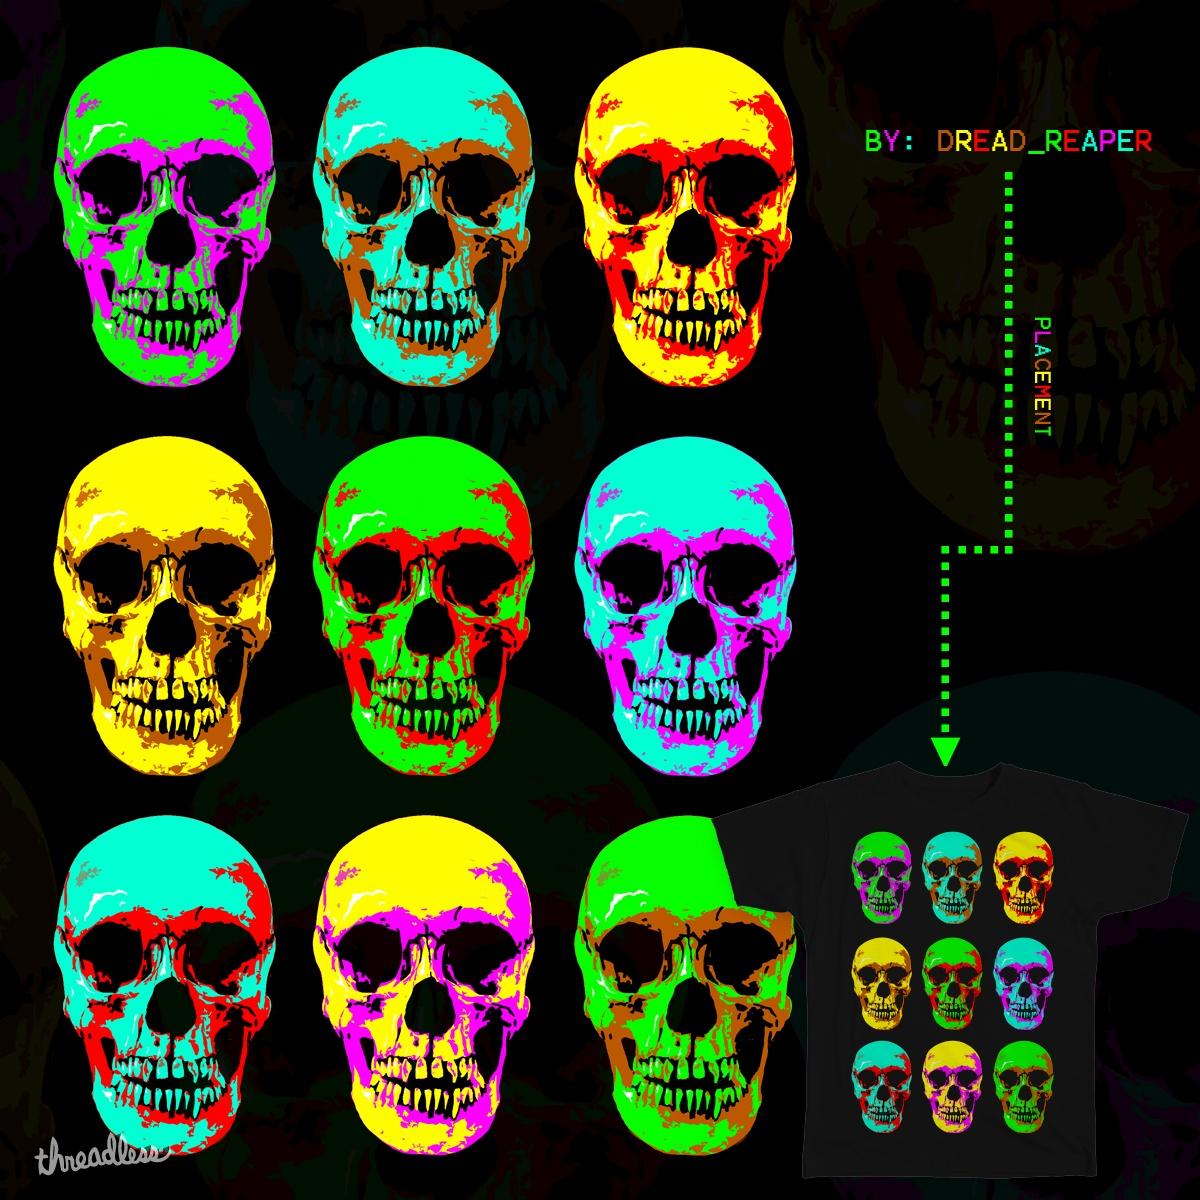 Neon Skulls by Nick_Nightshade on Threadless